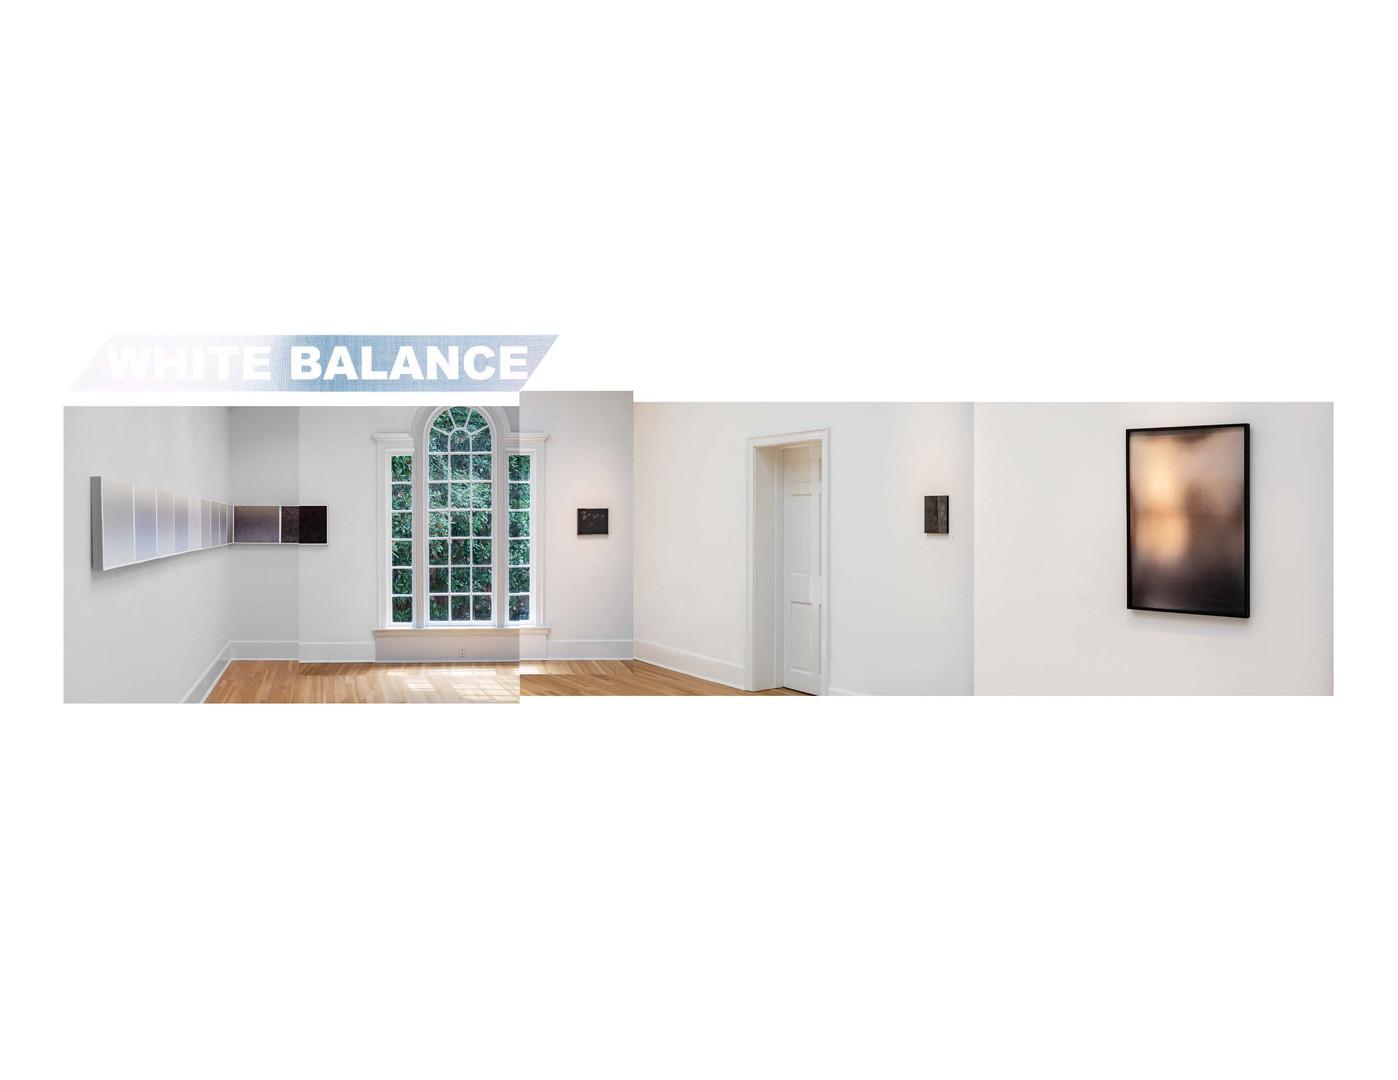 Installation View, White Balance, Swan Coach House 2019